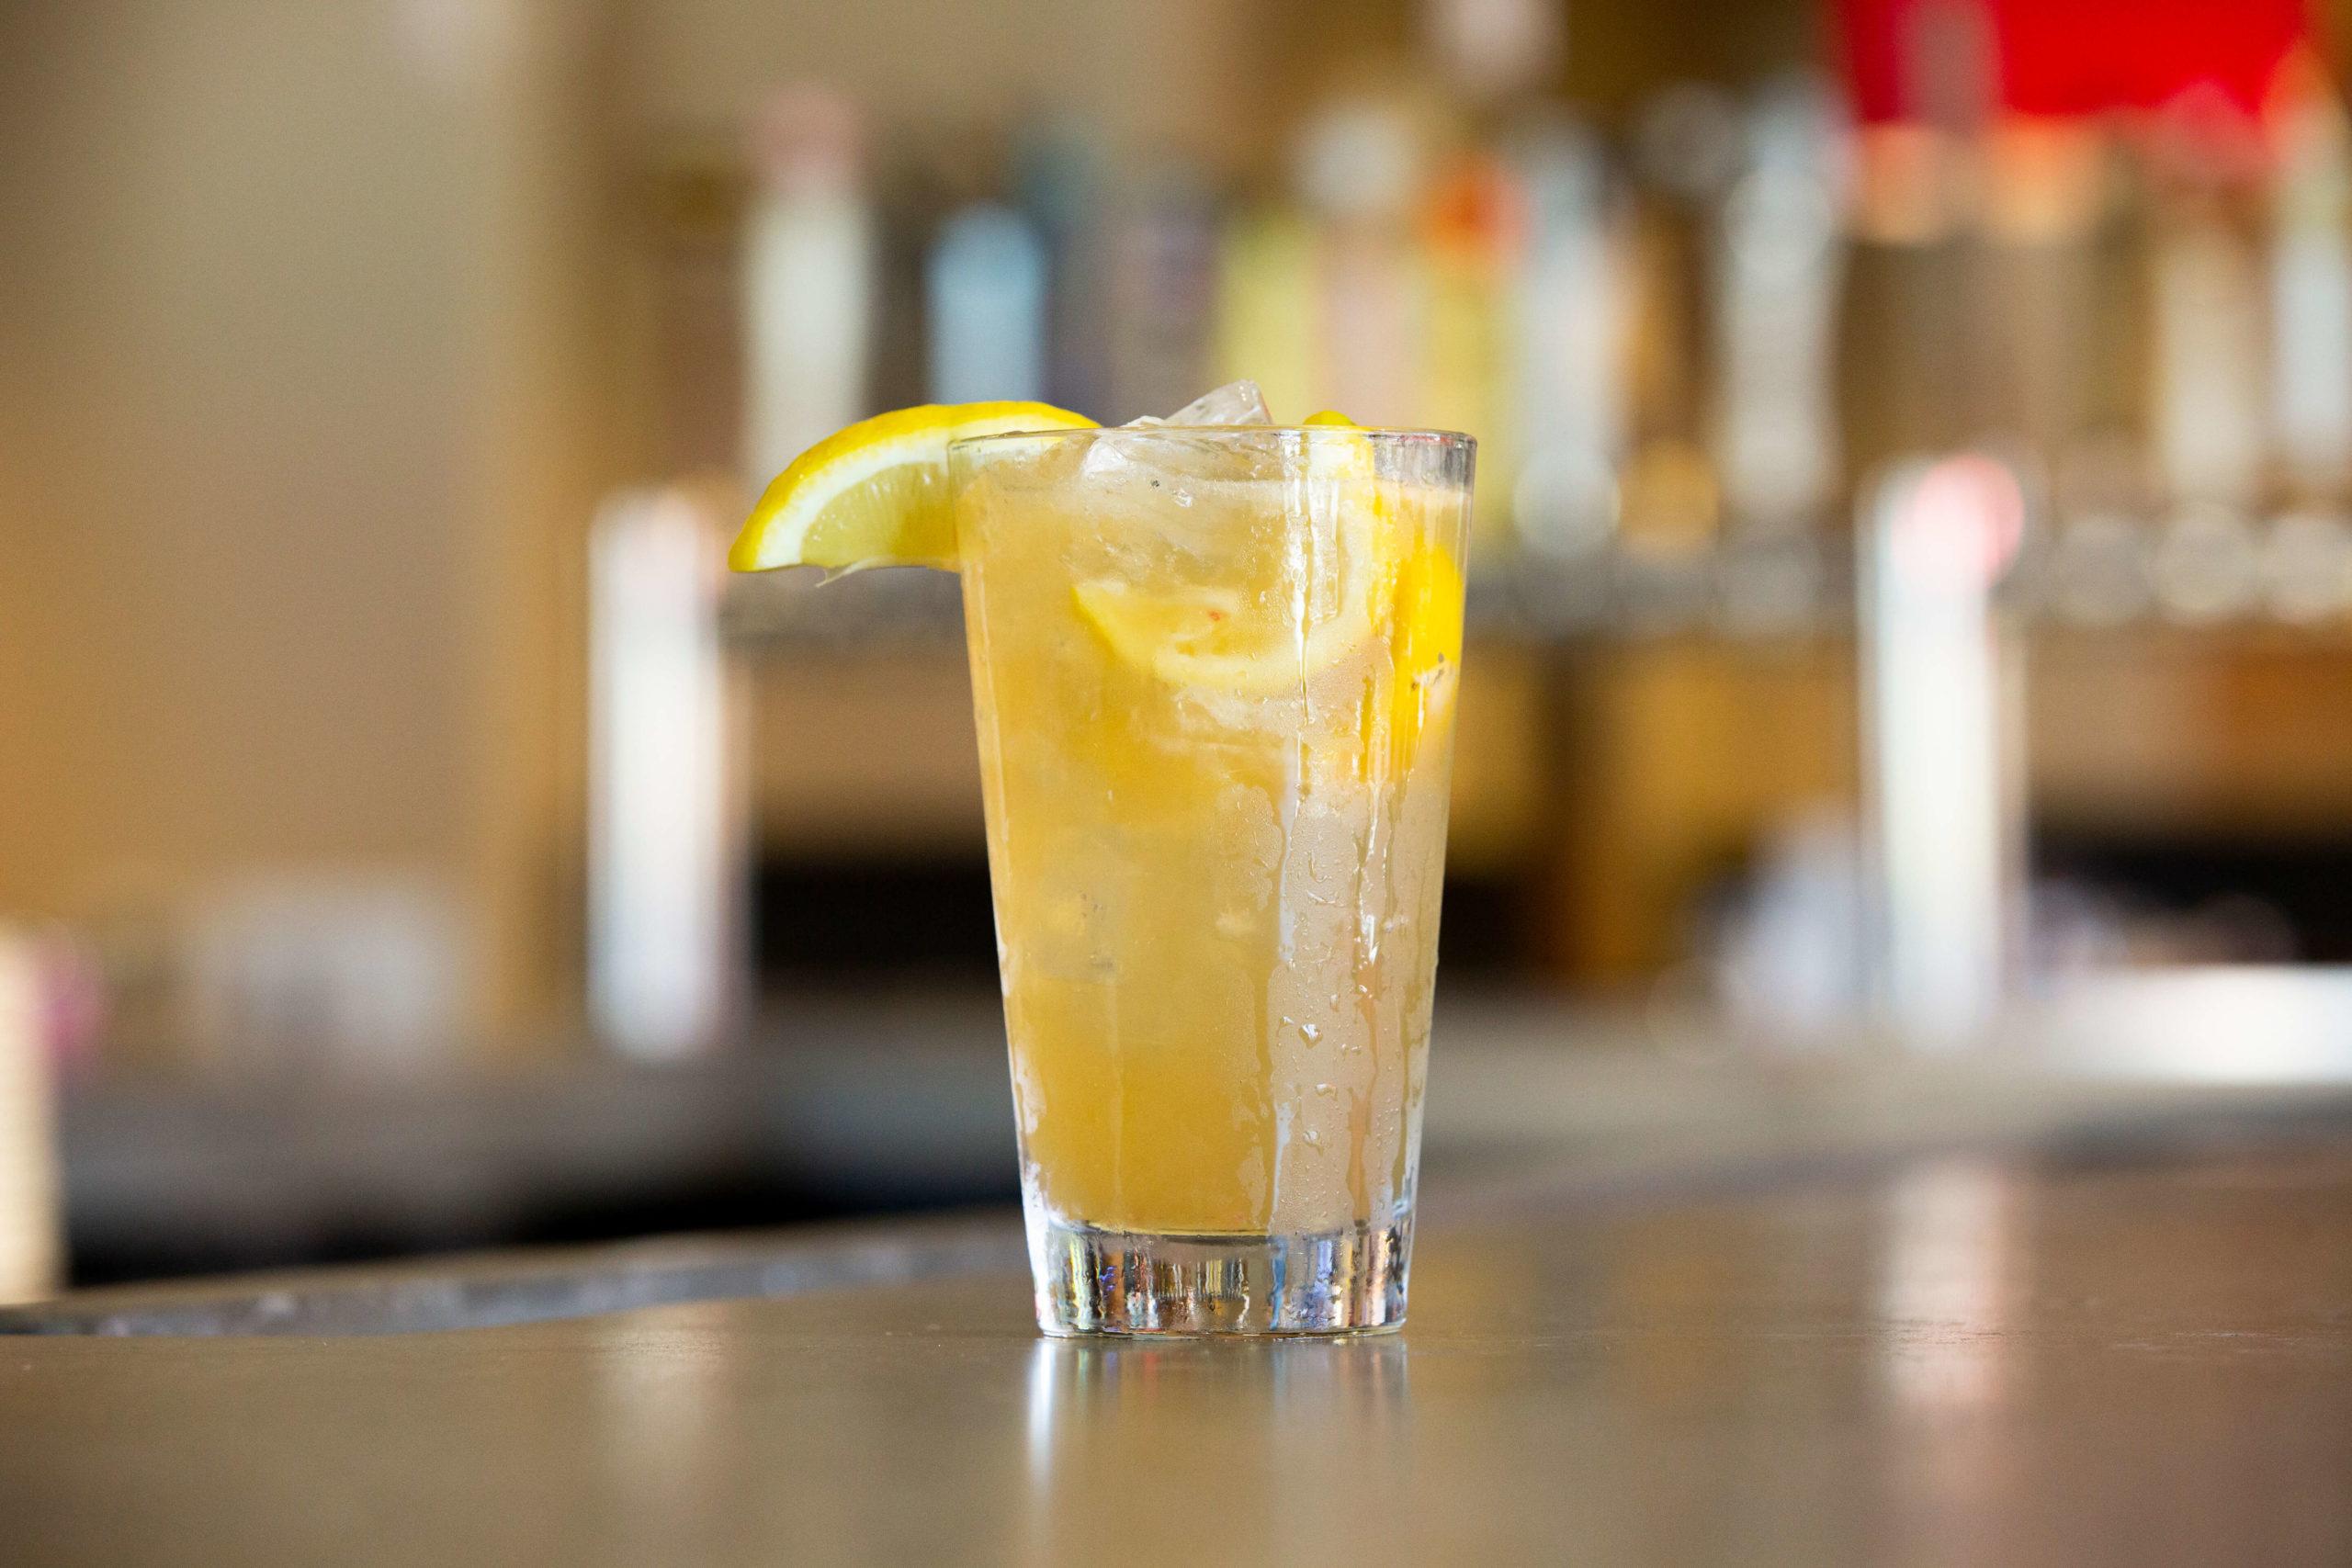 Lumberjack Lemonade